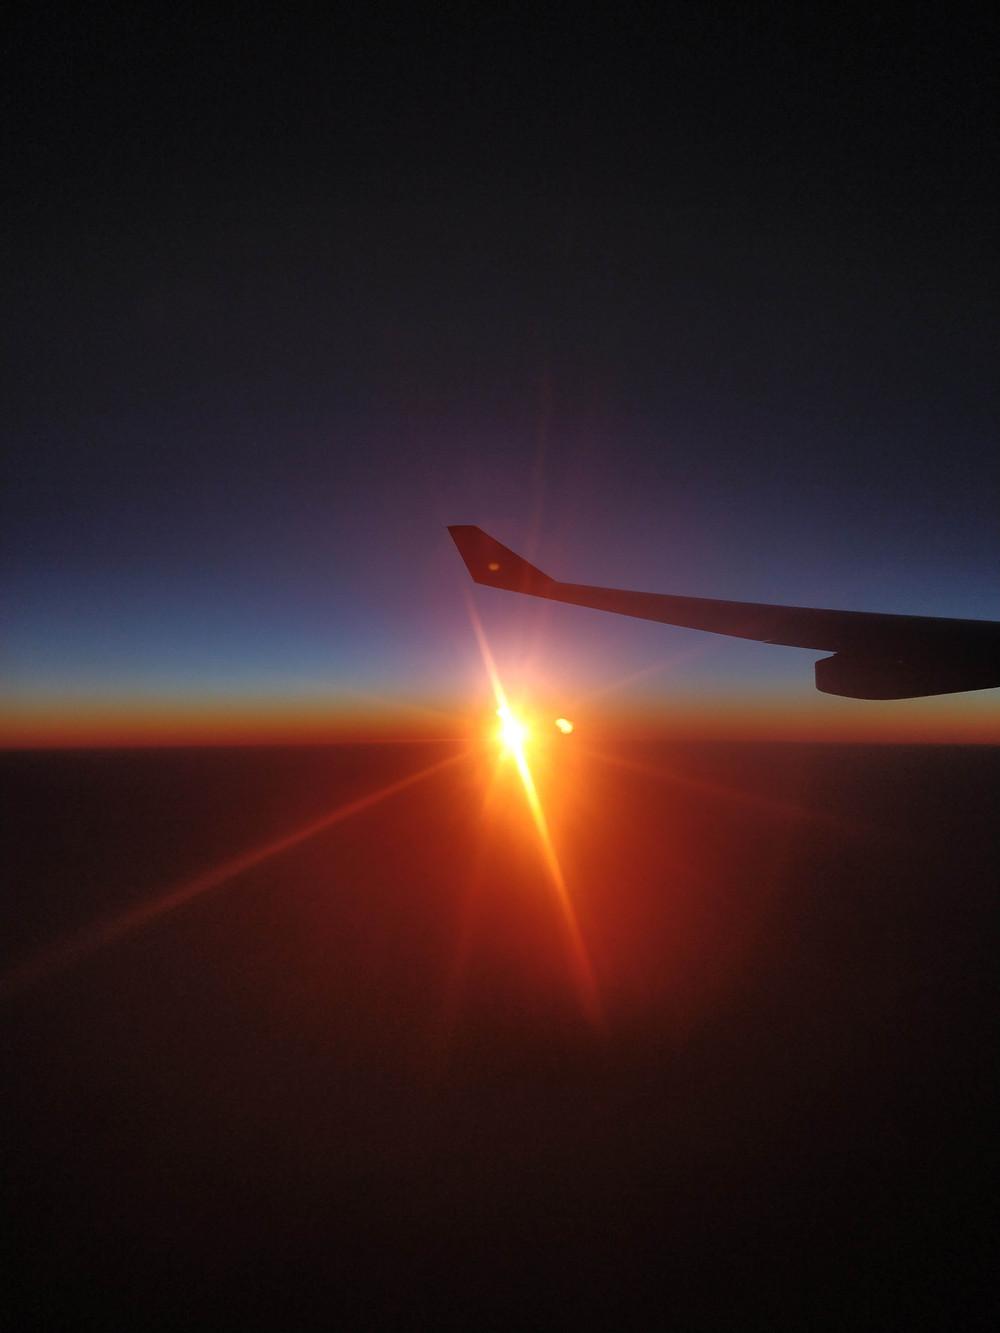 South Africa plane by Elisa Nuevo Vallin